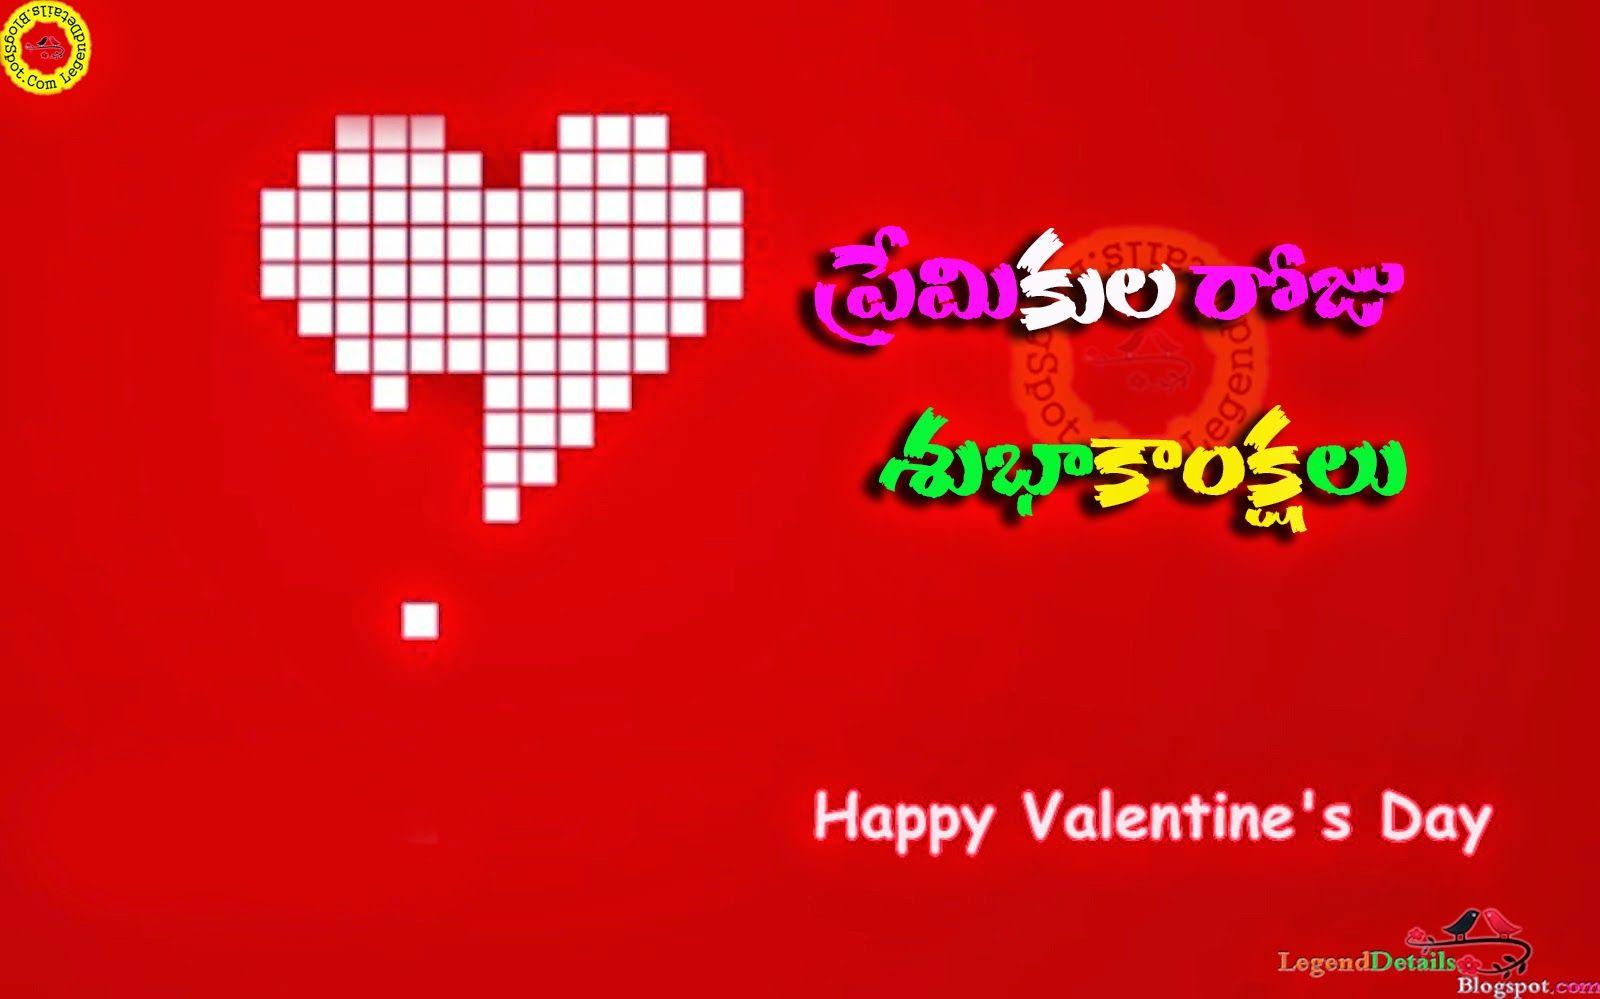 Valentines Day Wishes In Telugu Premikula Roju Subhakankshalu